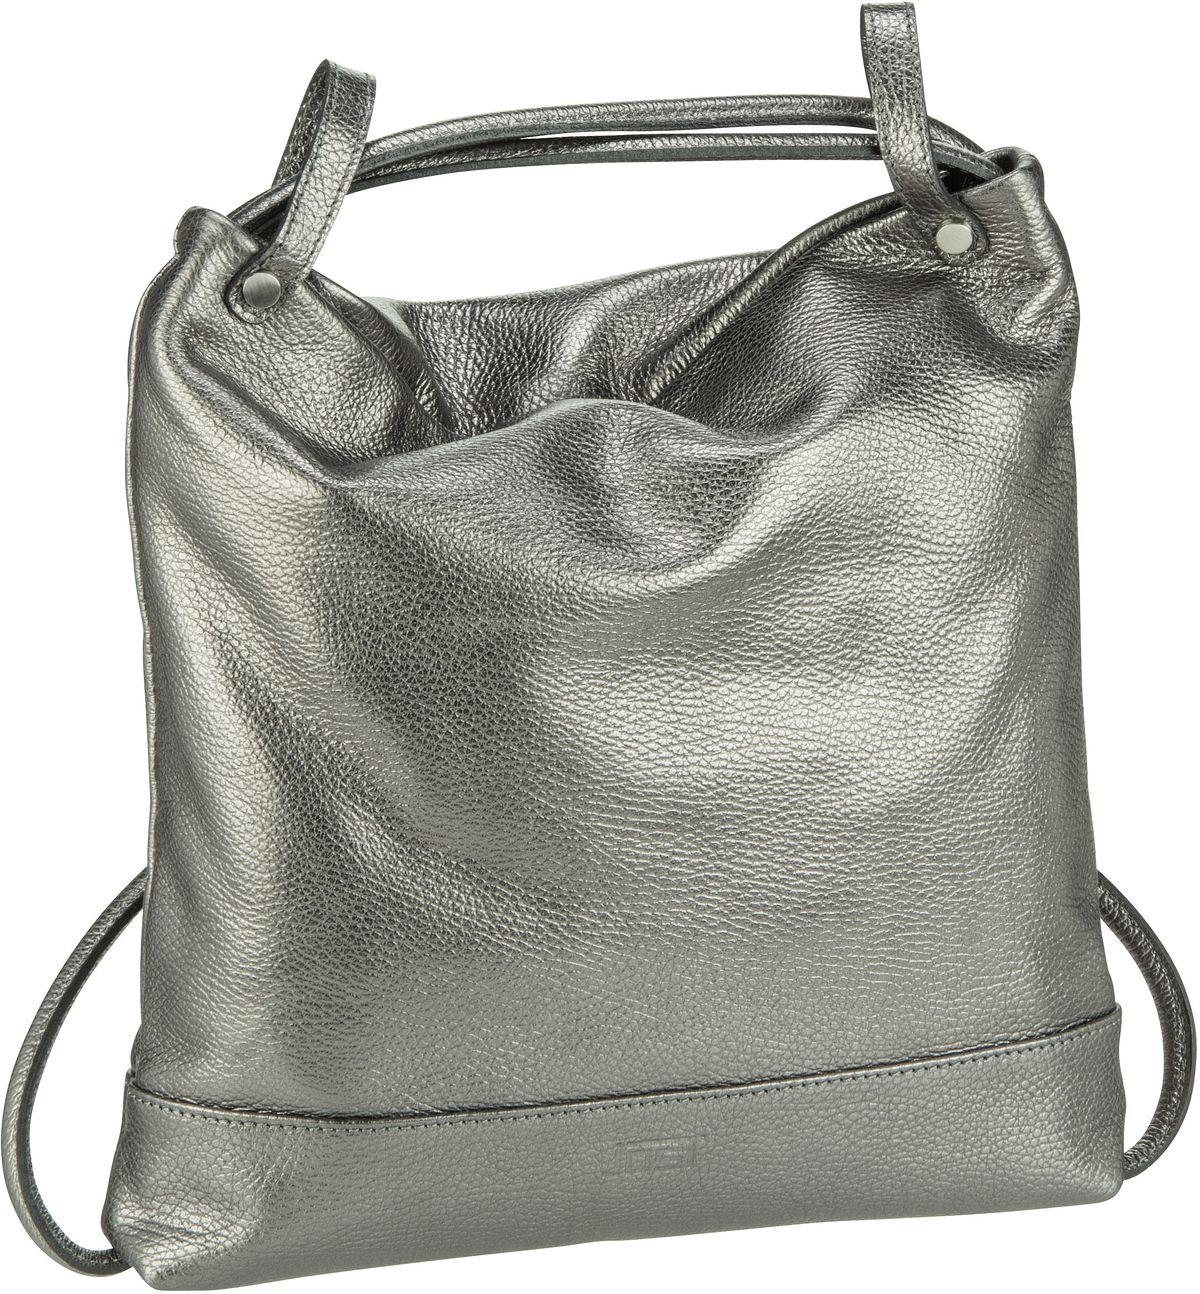 Rucksack / Daypack Vika 1831 Beutel-Rucksack Silver